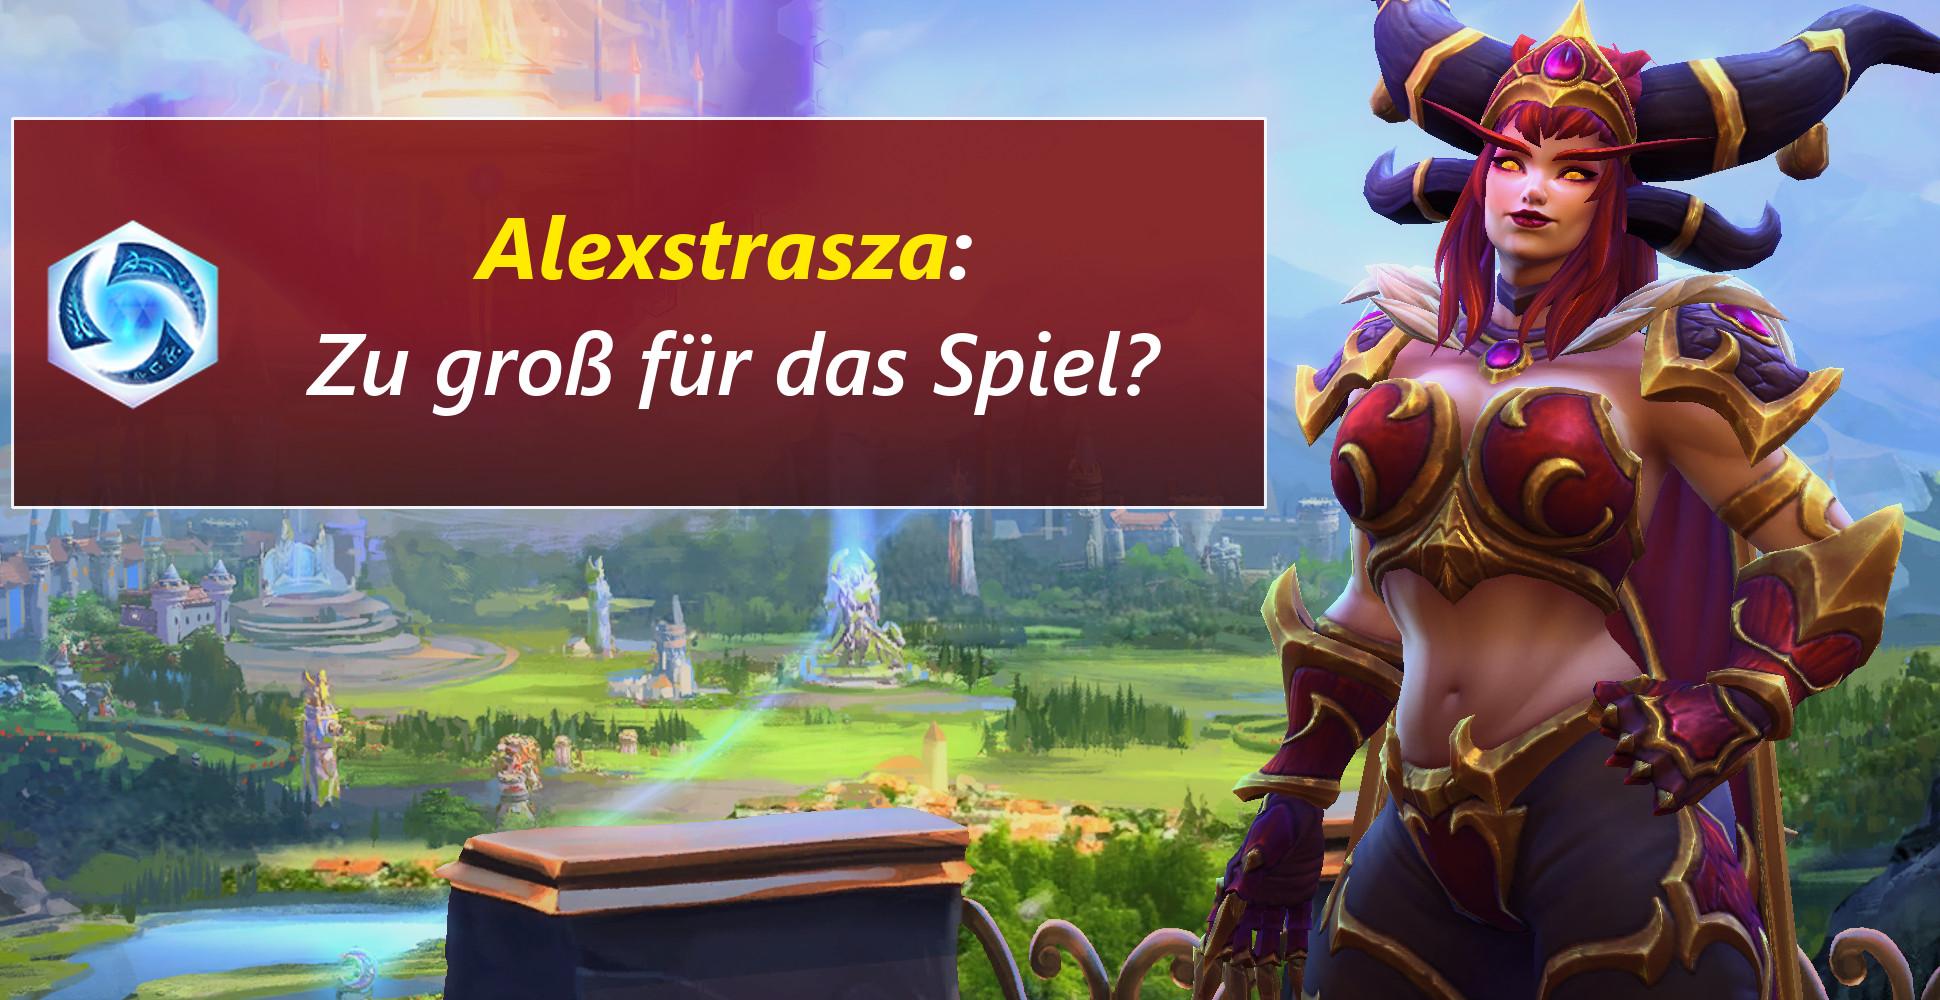 Heroes of the Storm: Alexstraszas wahre Form hätte das Spiel zerstört